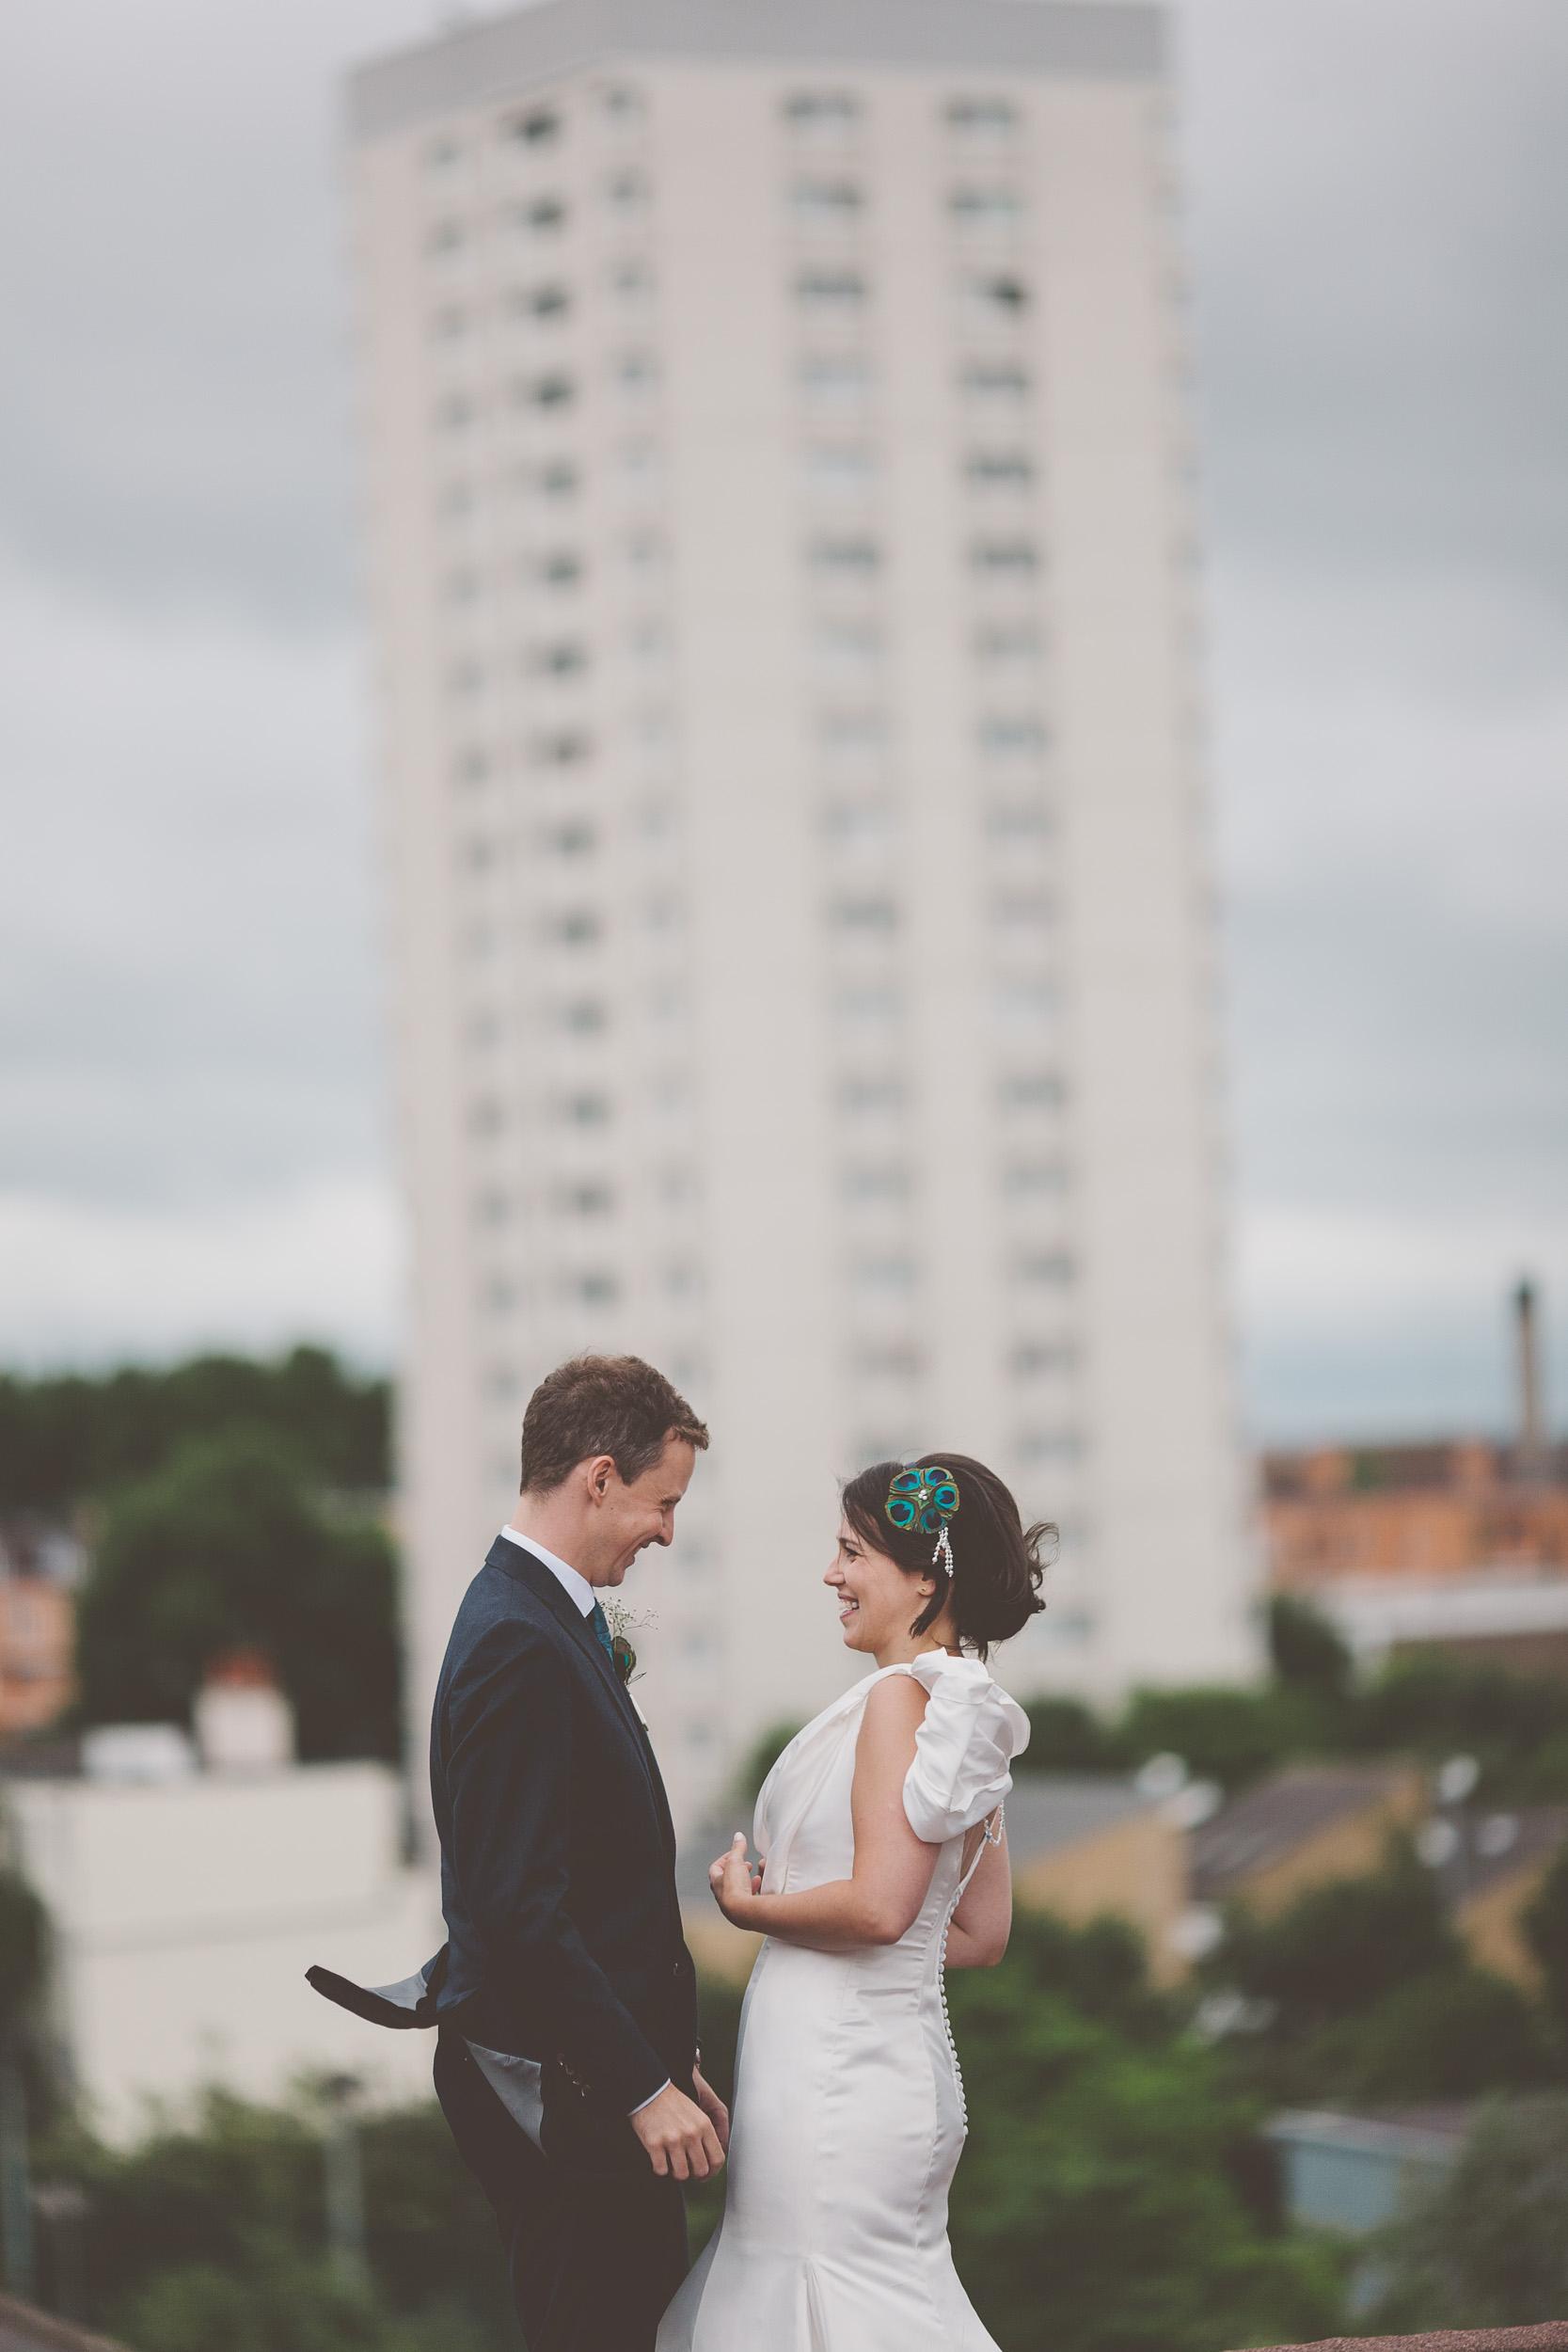 islington-town-hall-4th-floor-studios-wedding275.jpg